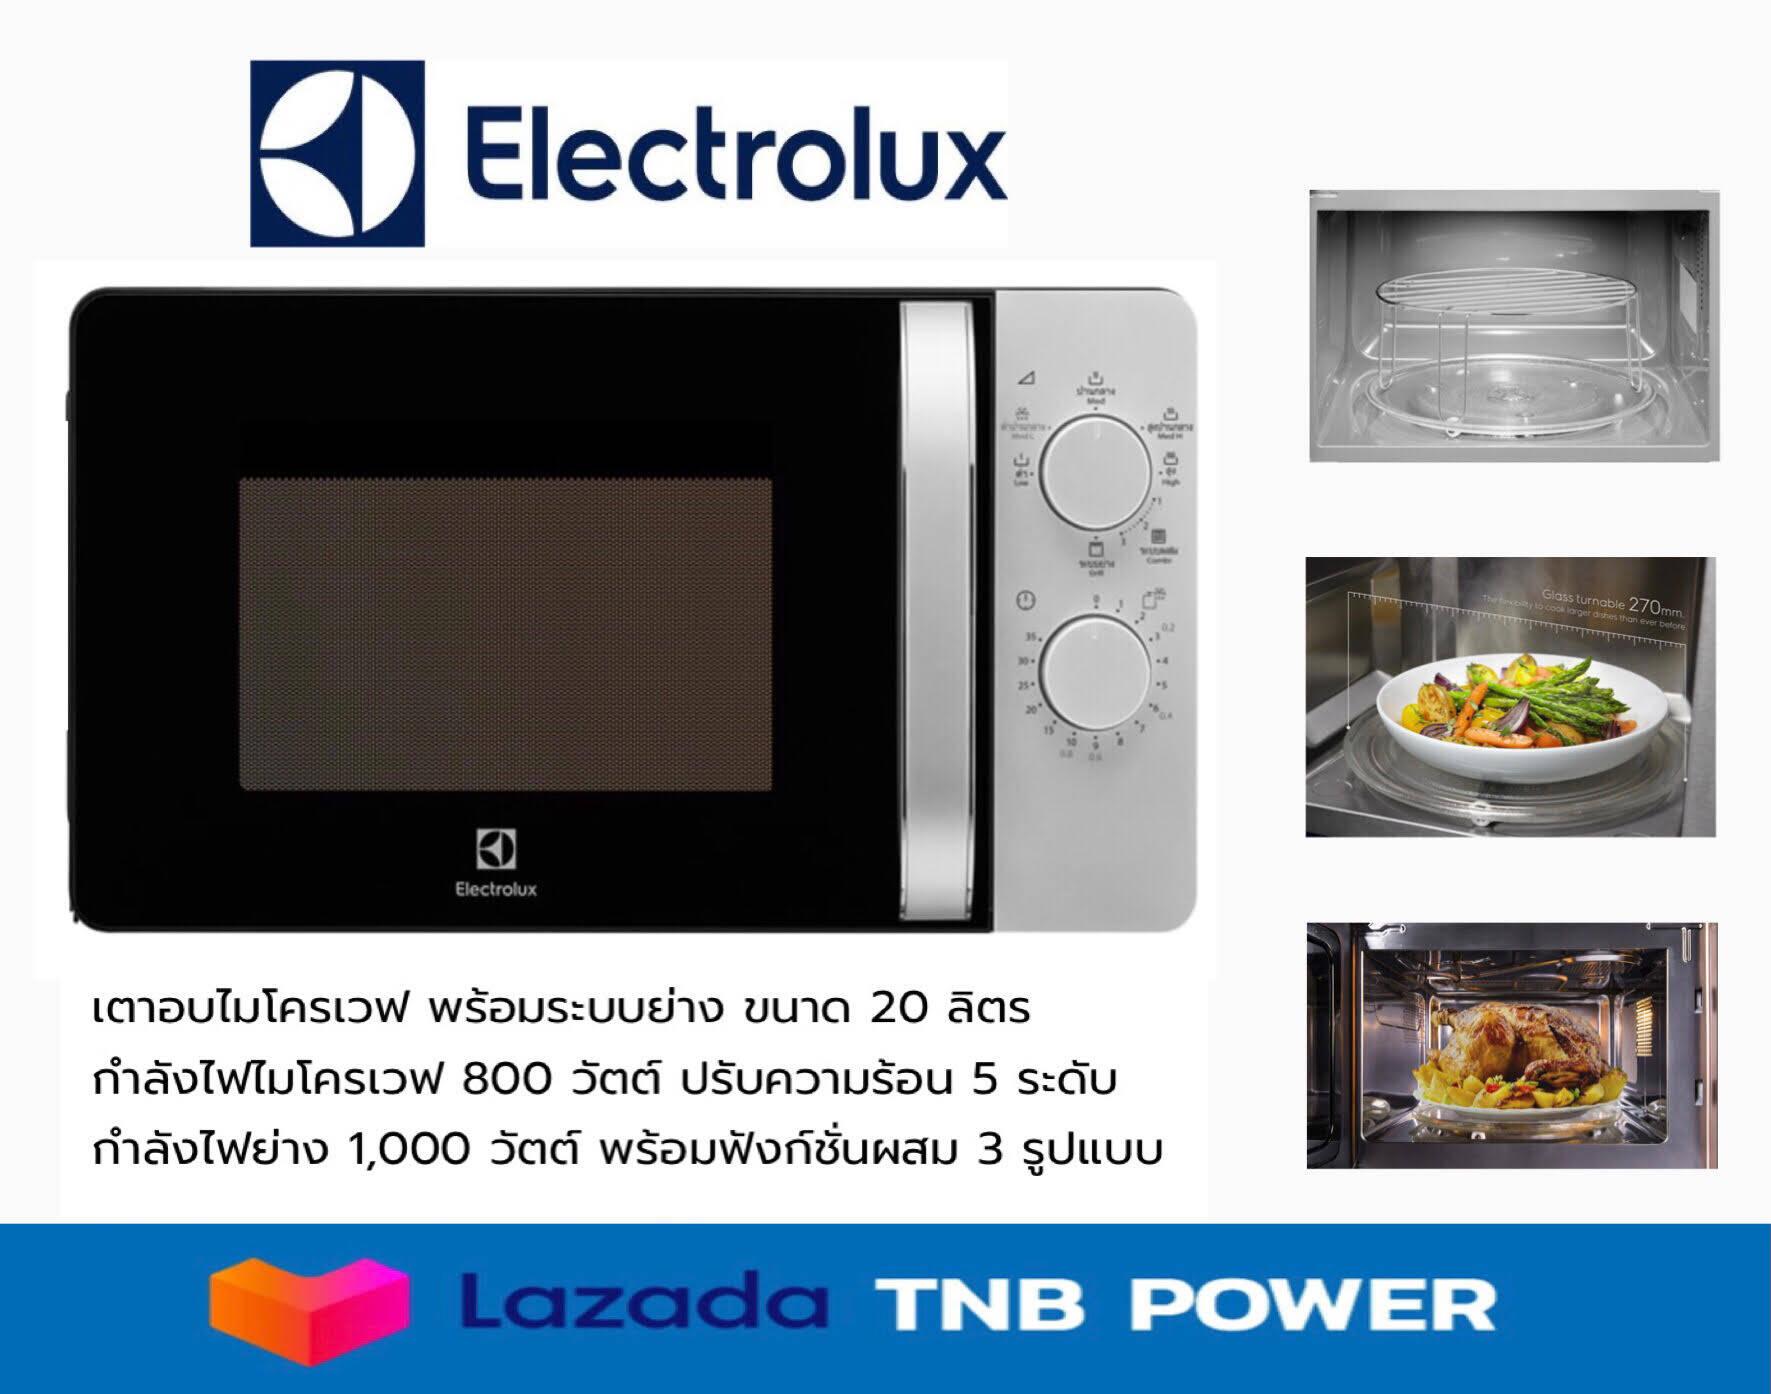 Electrolux เตาอบไมโครเวฟพร้อมระบบย่าง รุ่น EMG20K38GB ขนาด 20 ลิตร 800วัตต์